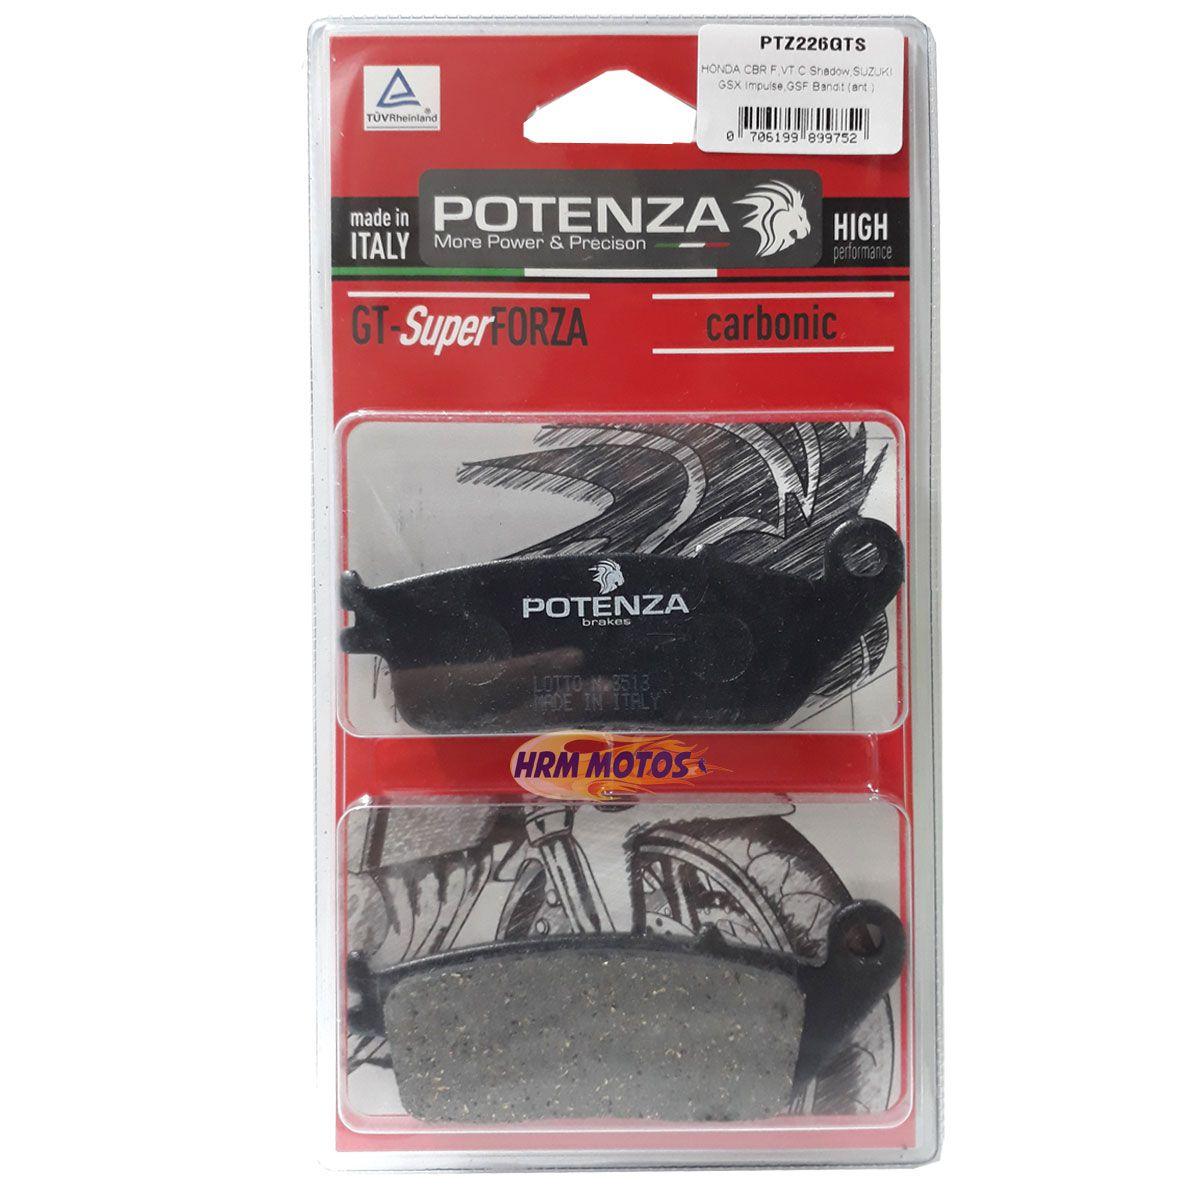 Pastilha Freio Potenza Tiger 800/xc/Hornet até 2007/CBR 250/VT 600/750 PTZ226GTS Super Forza